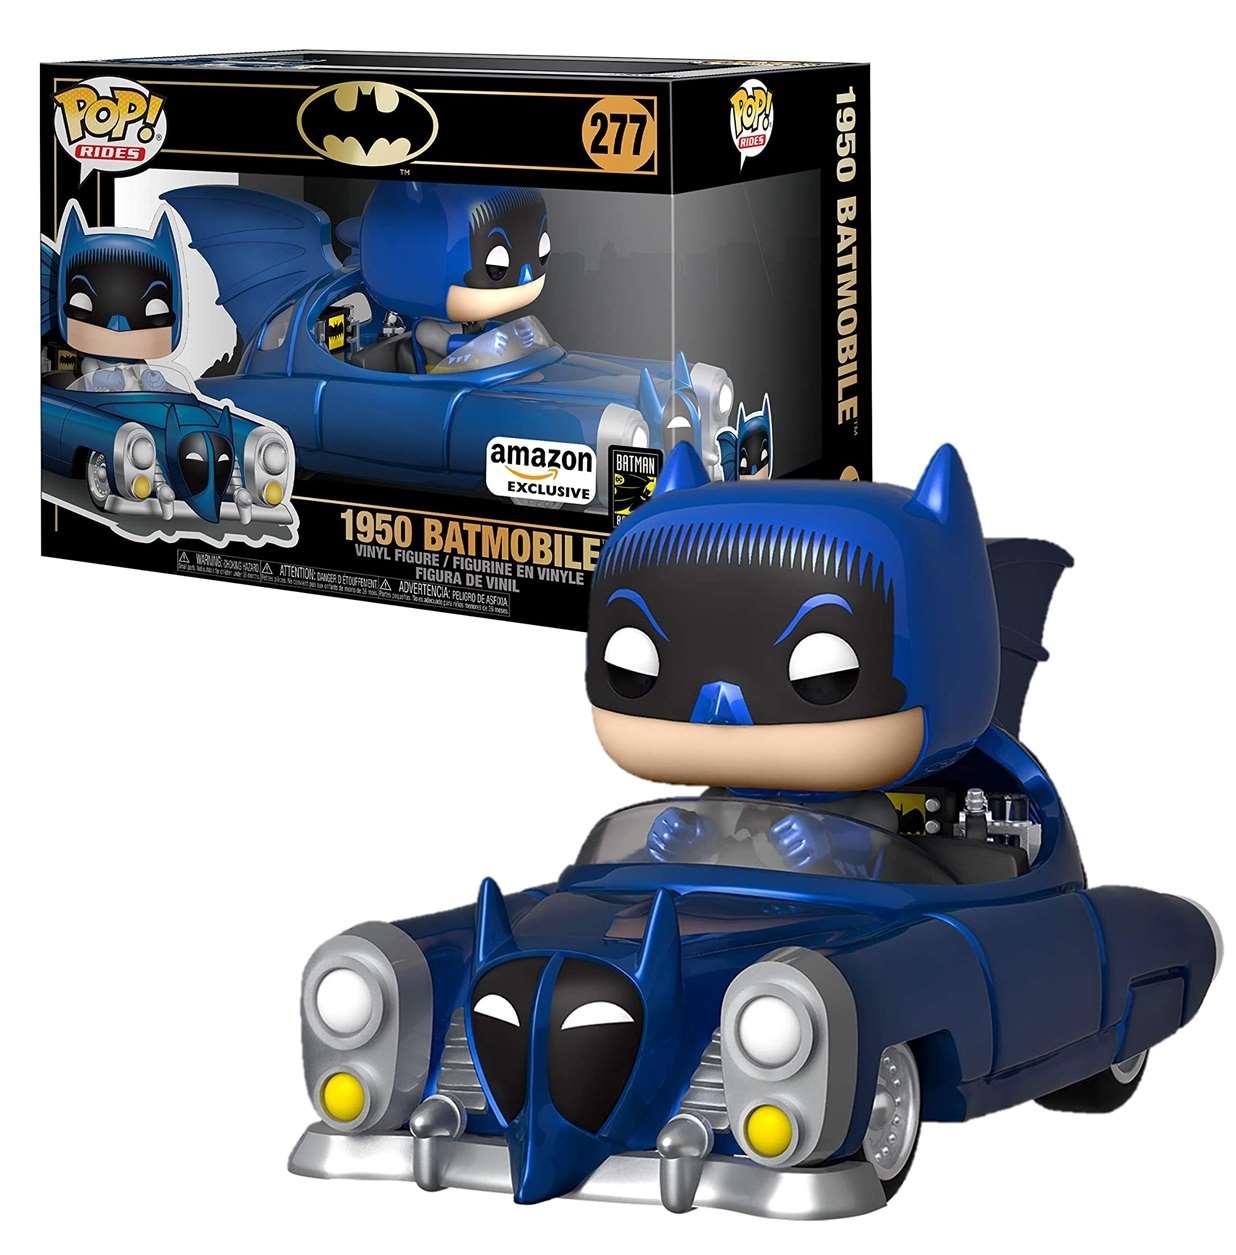 Batman #277 1950 Batmobile Funko Pop! Ride Exclusivo Amazon